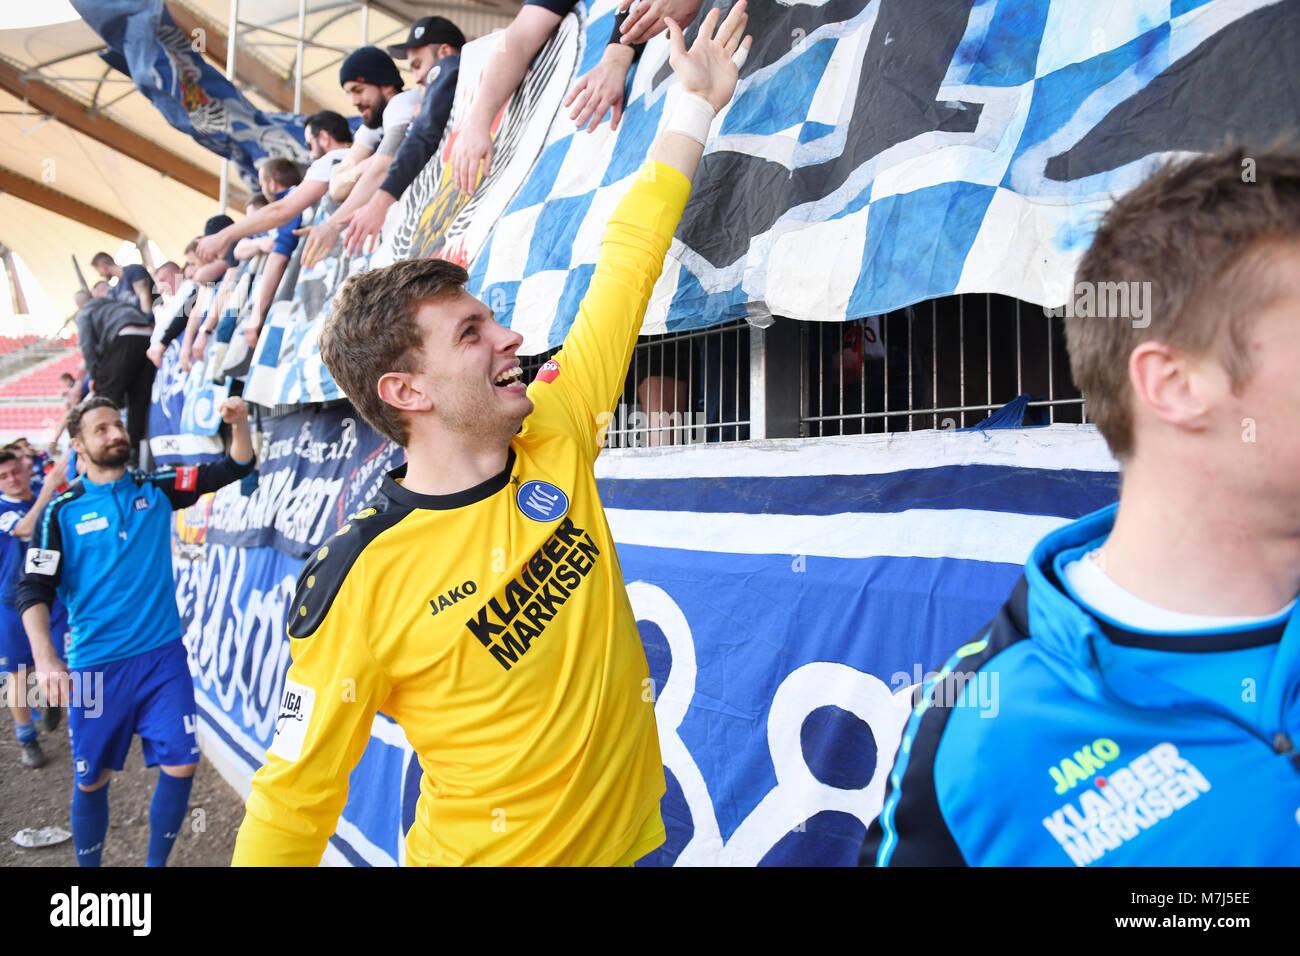 Spieler des KSC after dem Spiel bei den Fans: goalwart Benjamin Uphoff (KSC).  GES/ Fussball/ 3. Liga: RW Erfurt - Stock Image